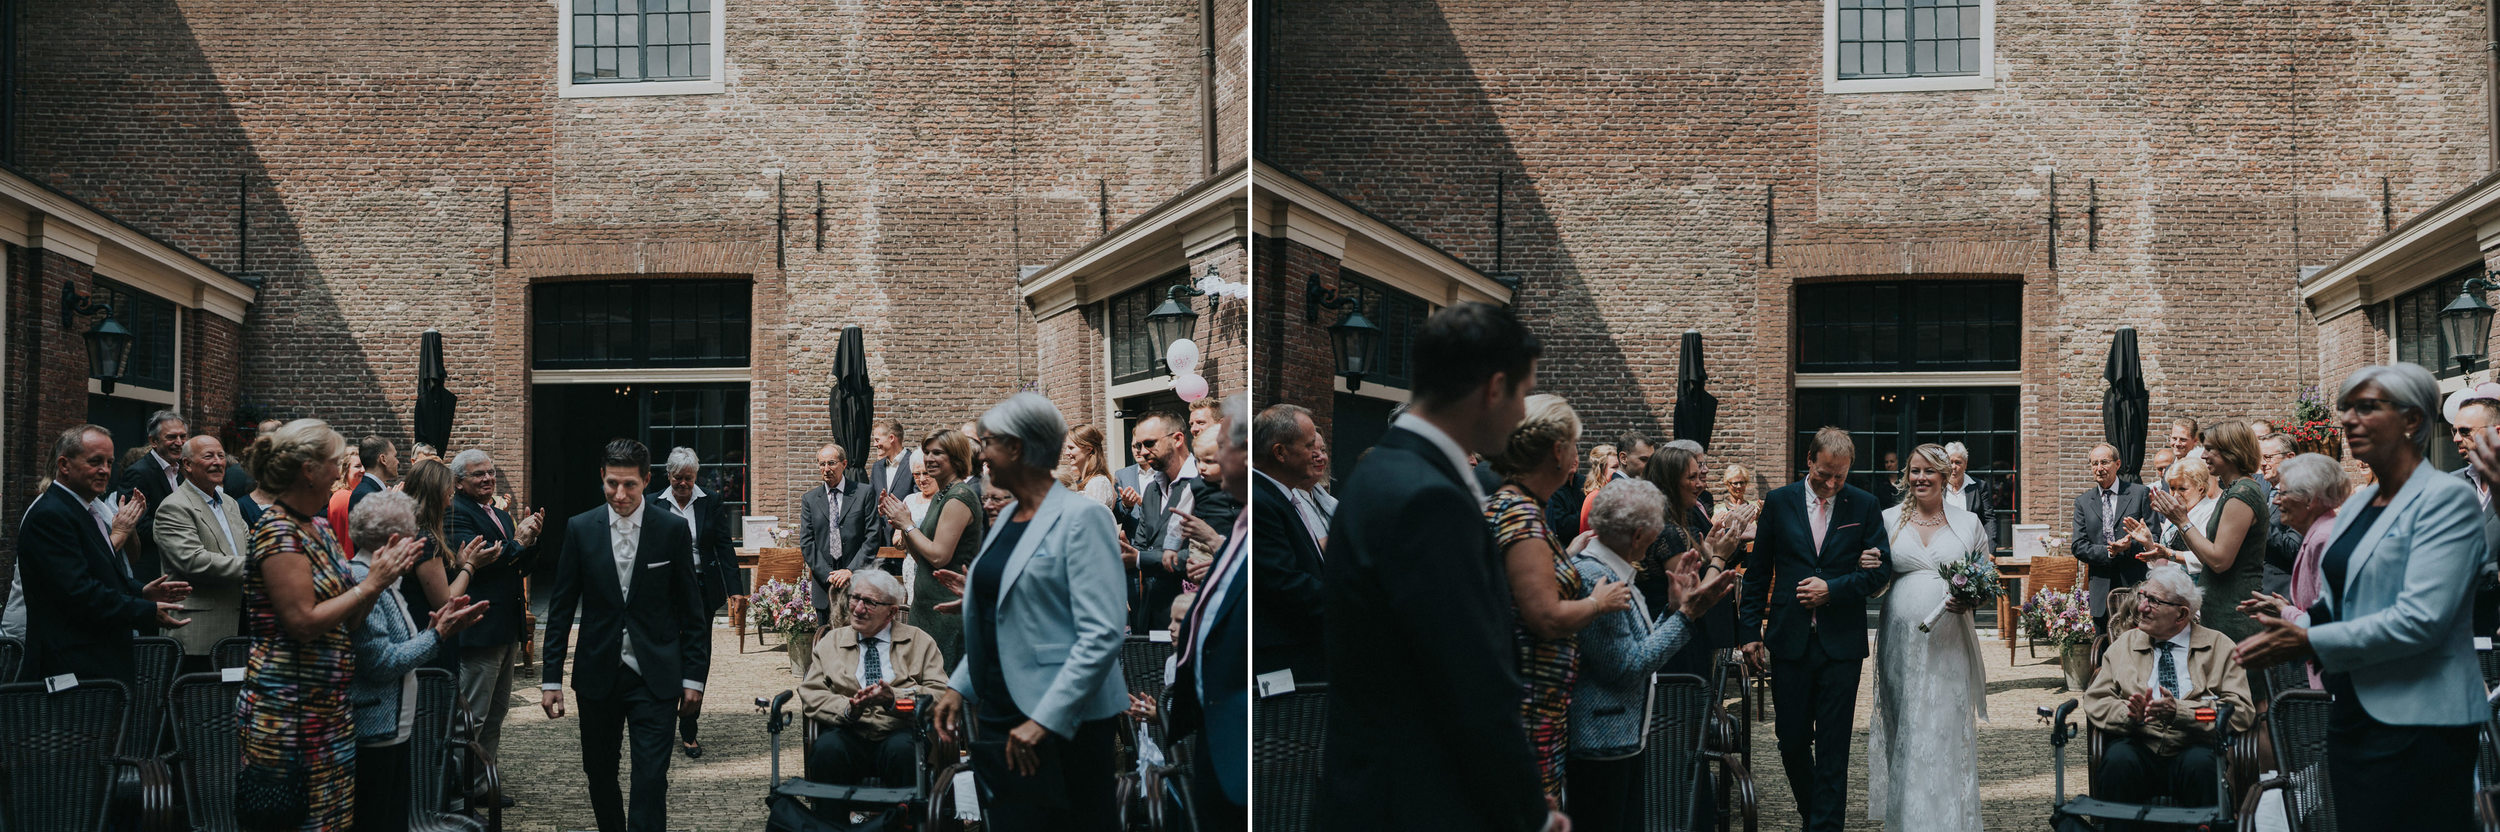 bruidsfotografie-amsterdam-utrecht-mark-hadden-wedding-photography-rowan-gideon-202 copy.jpg